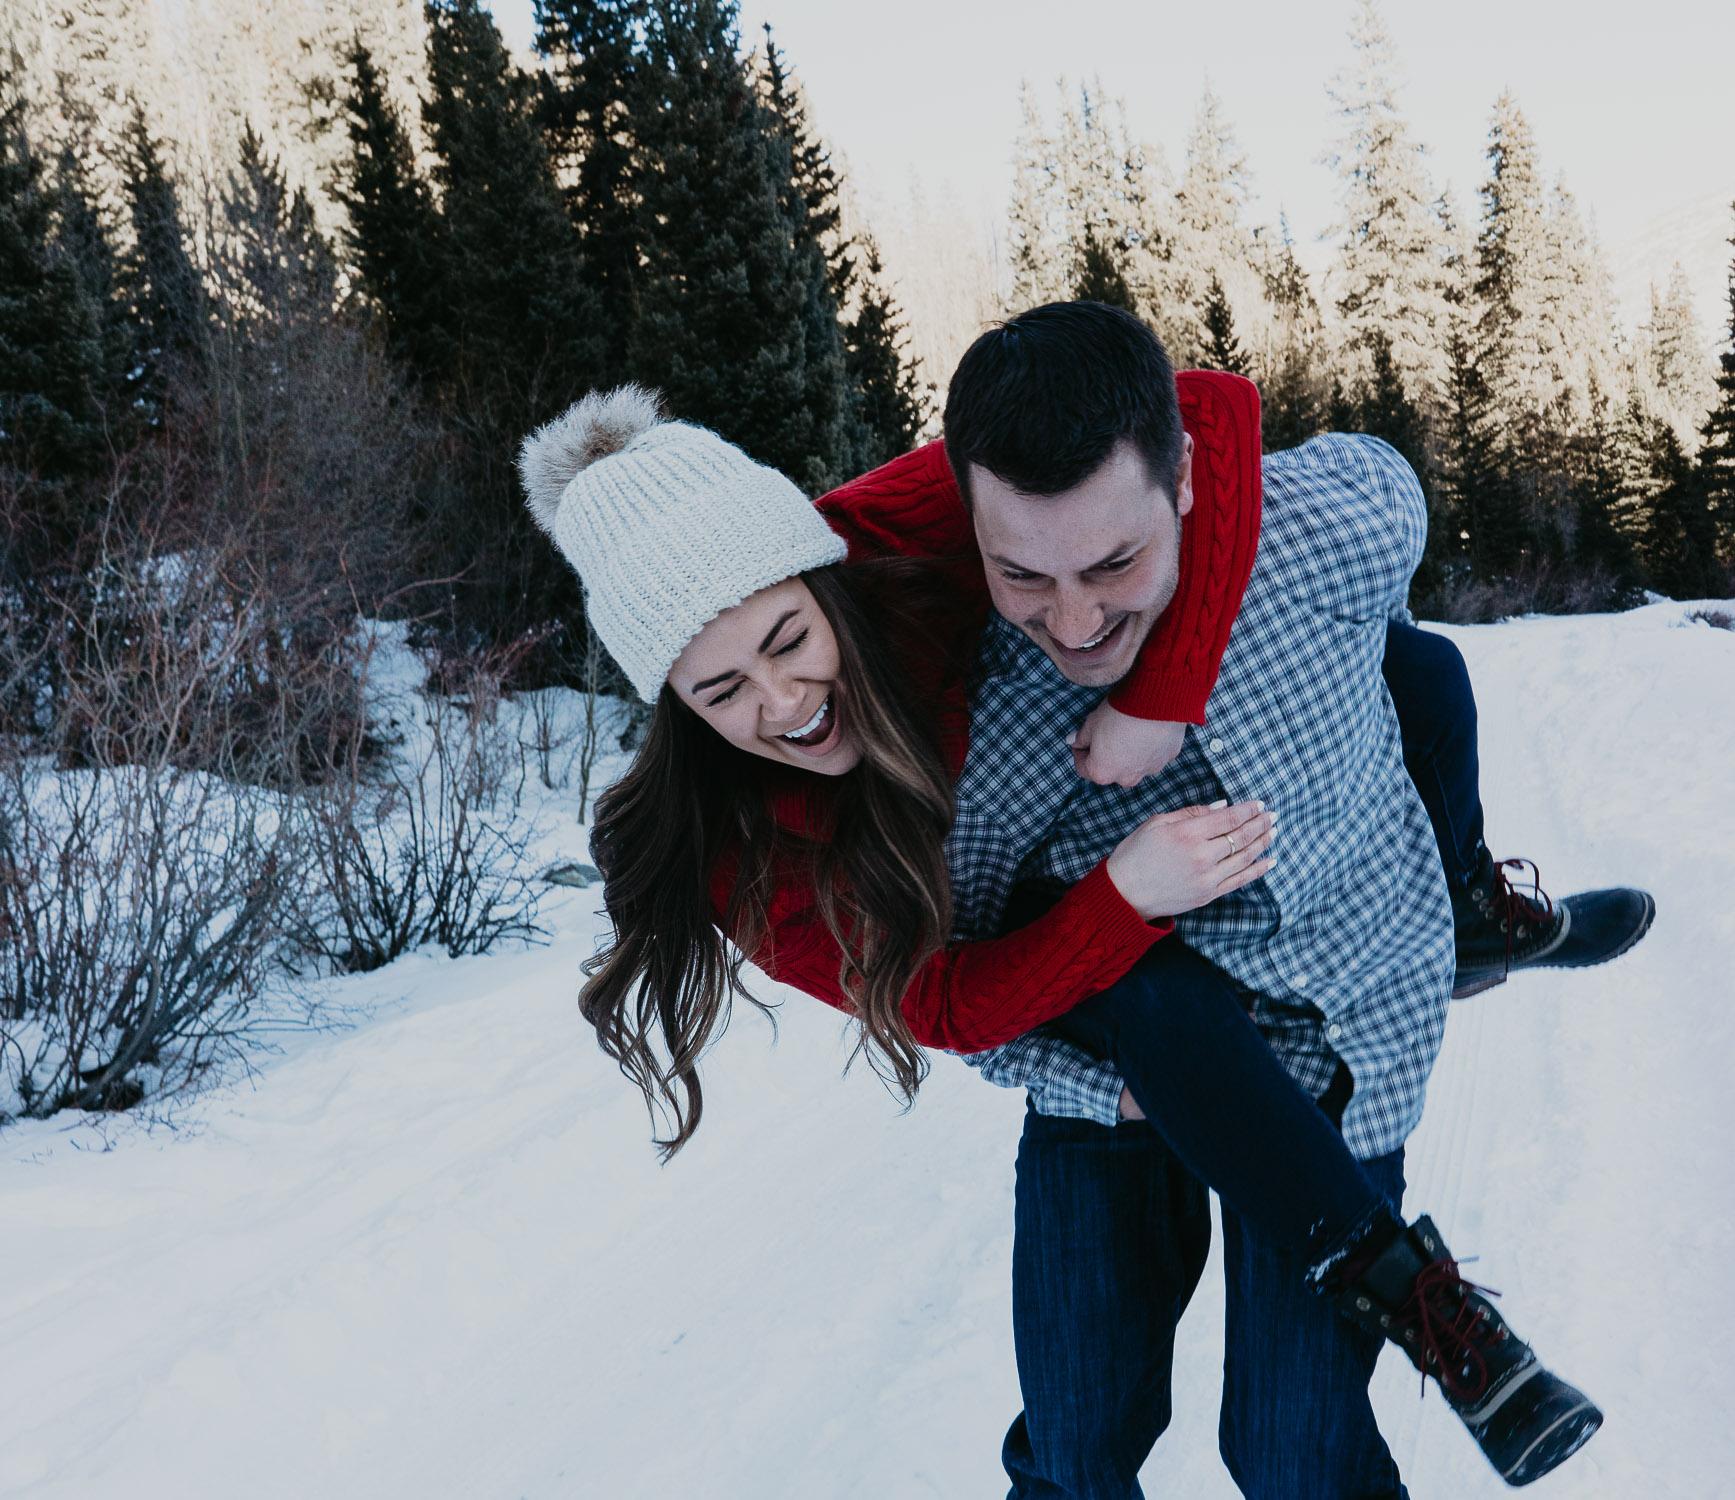 Colorado Engagement Photographer, Adventure, Elopement, Couple Photography, Breckenridge, winter, snow